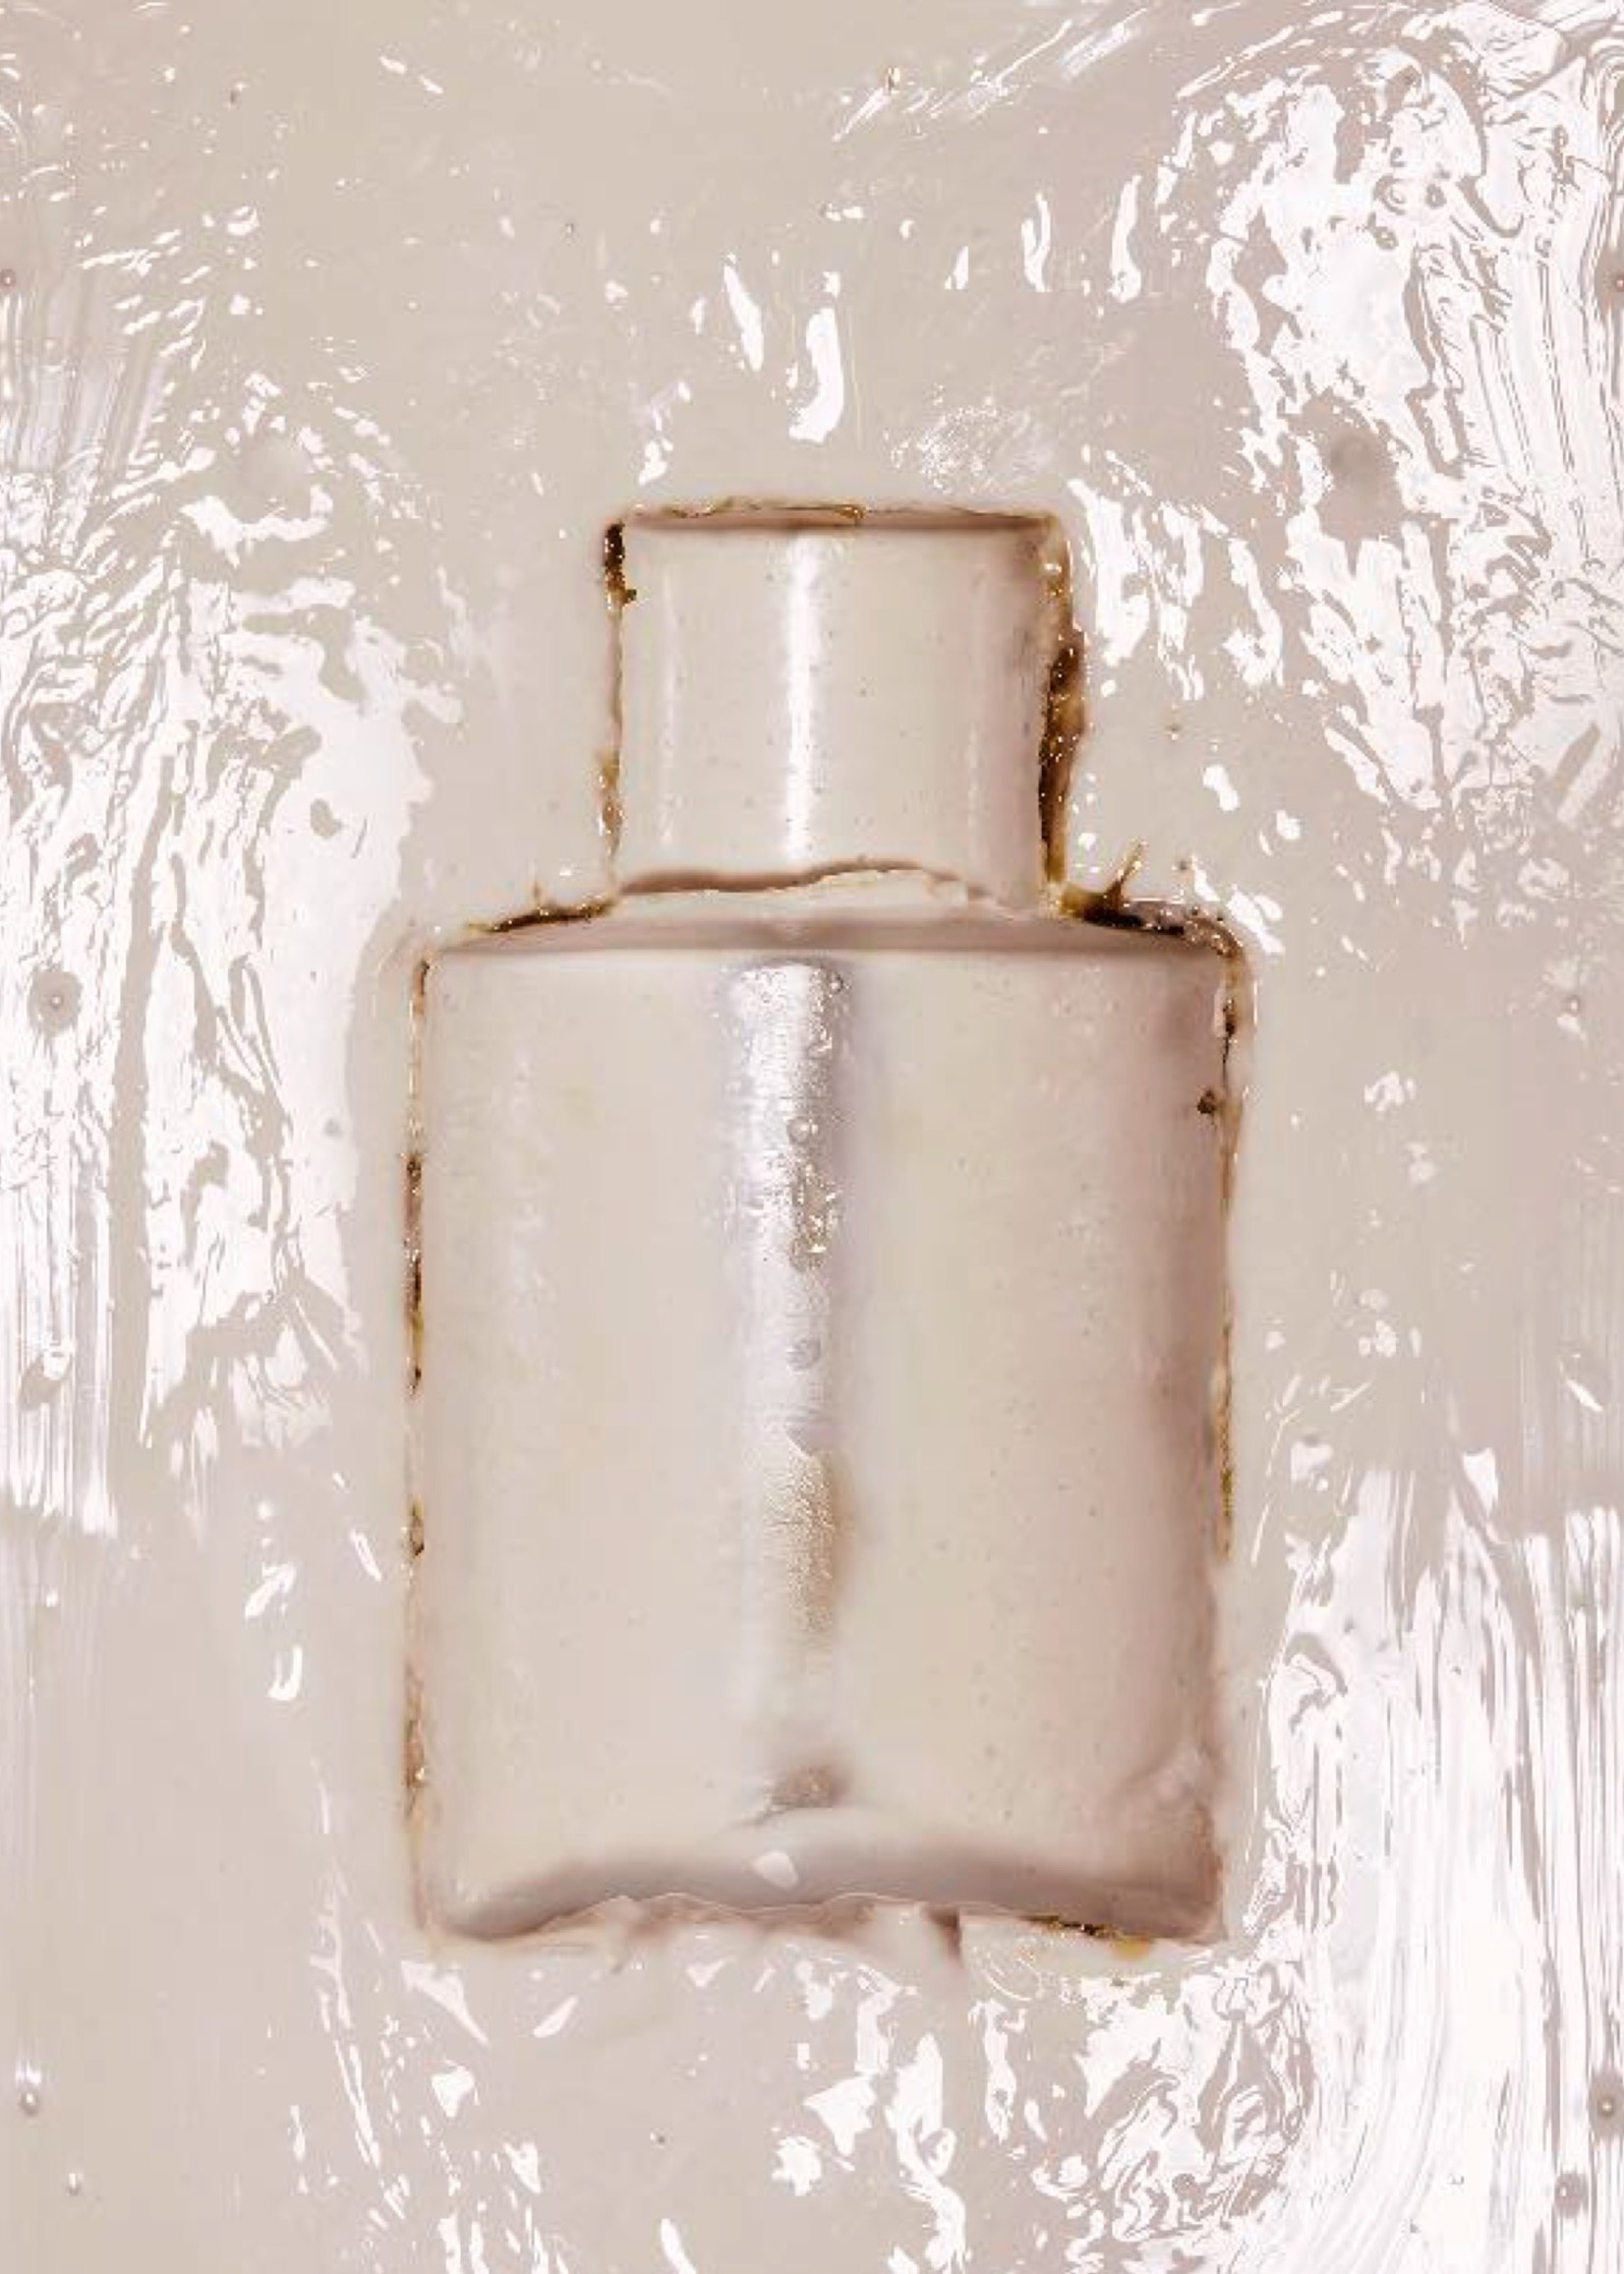 Aether AETHER - CELLULOID - Eau de Parfum